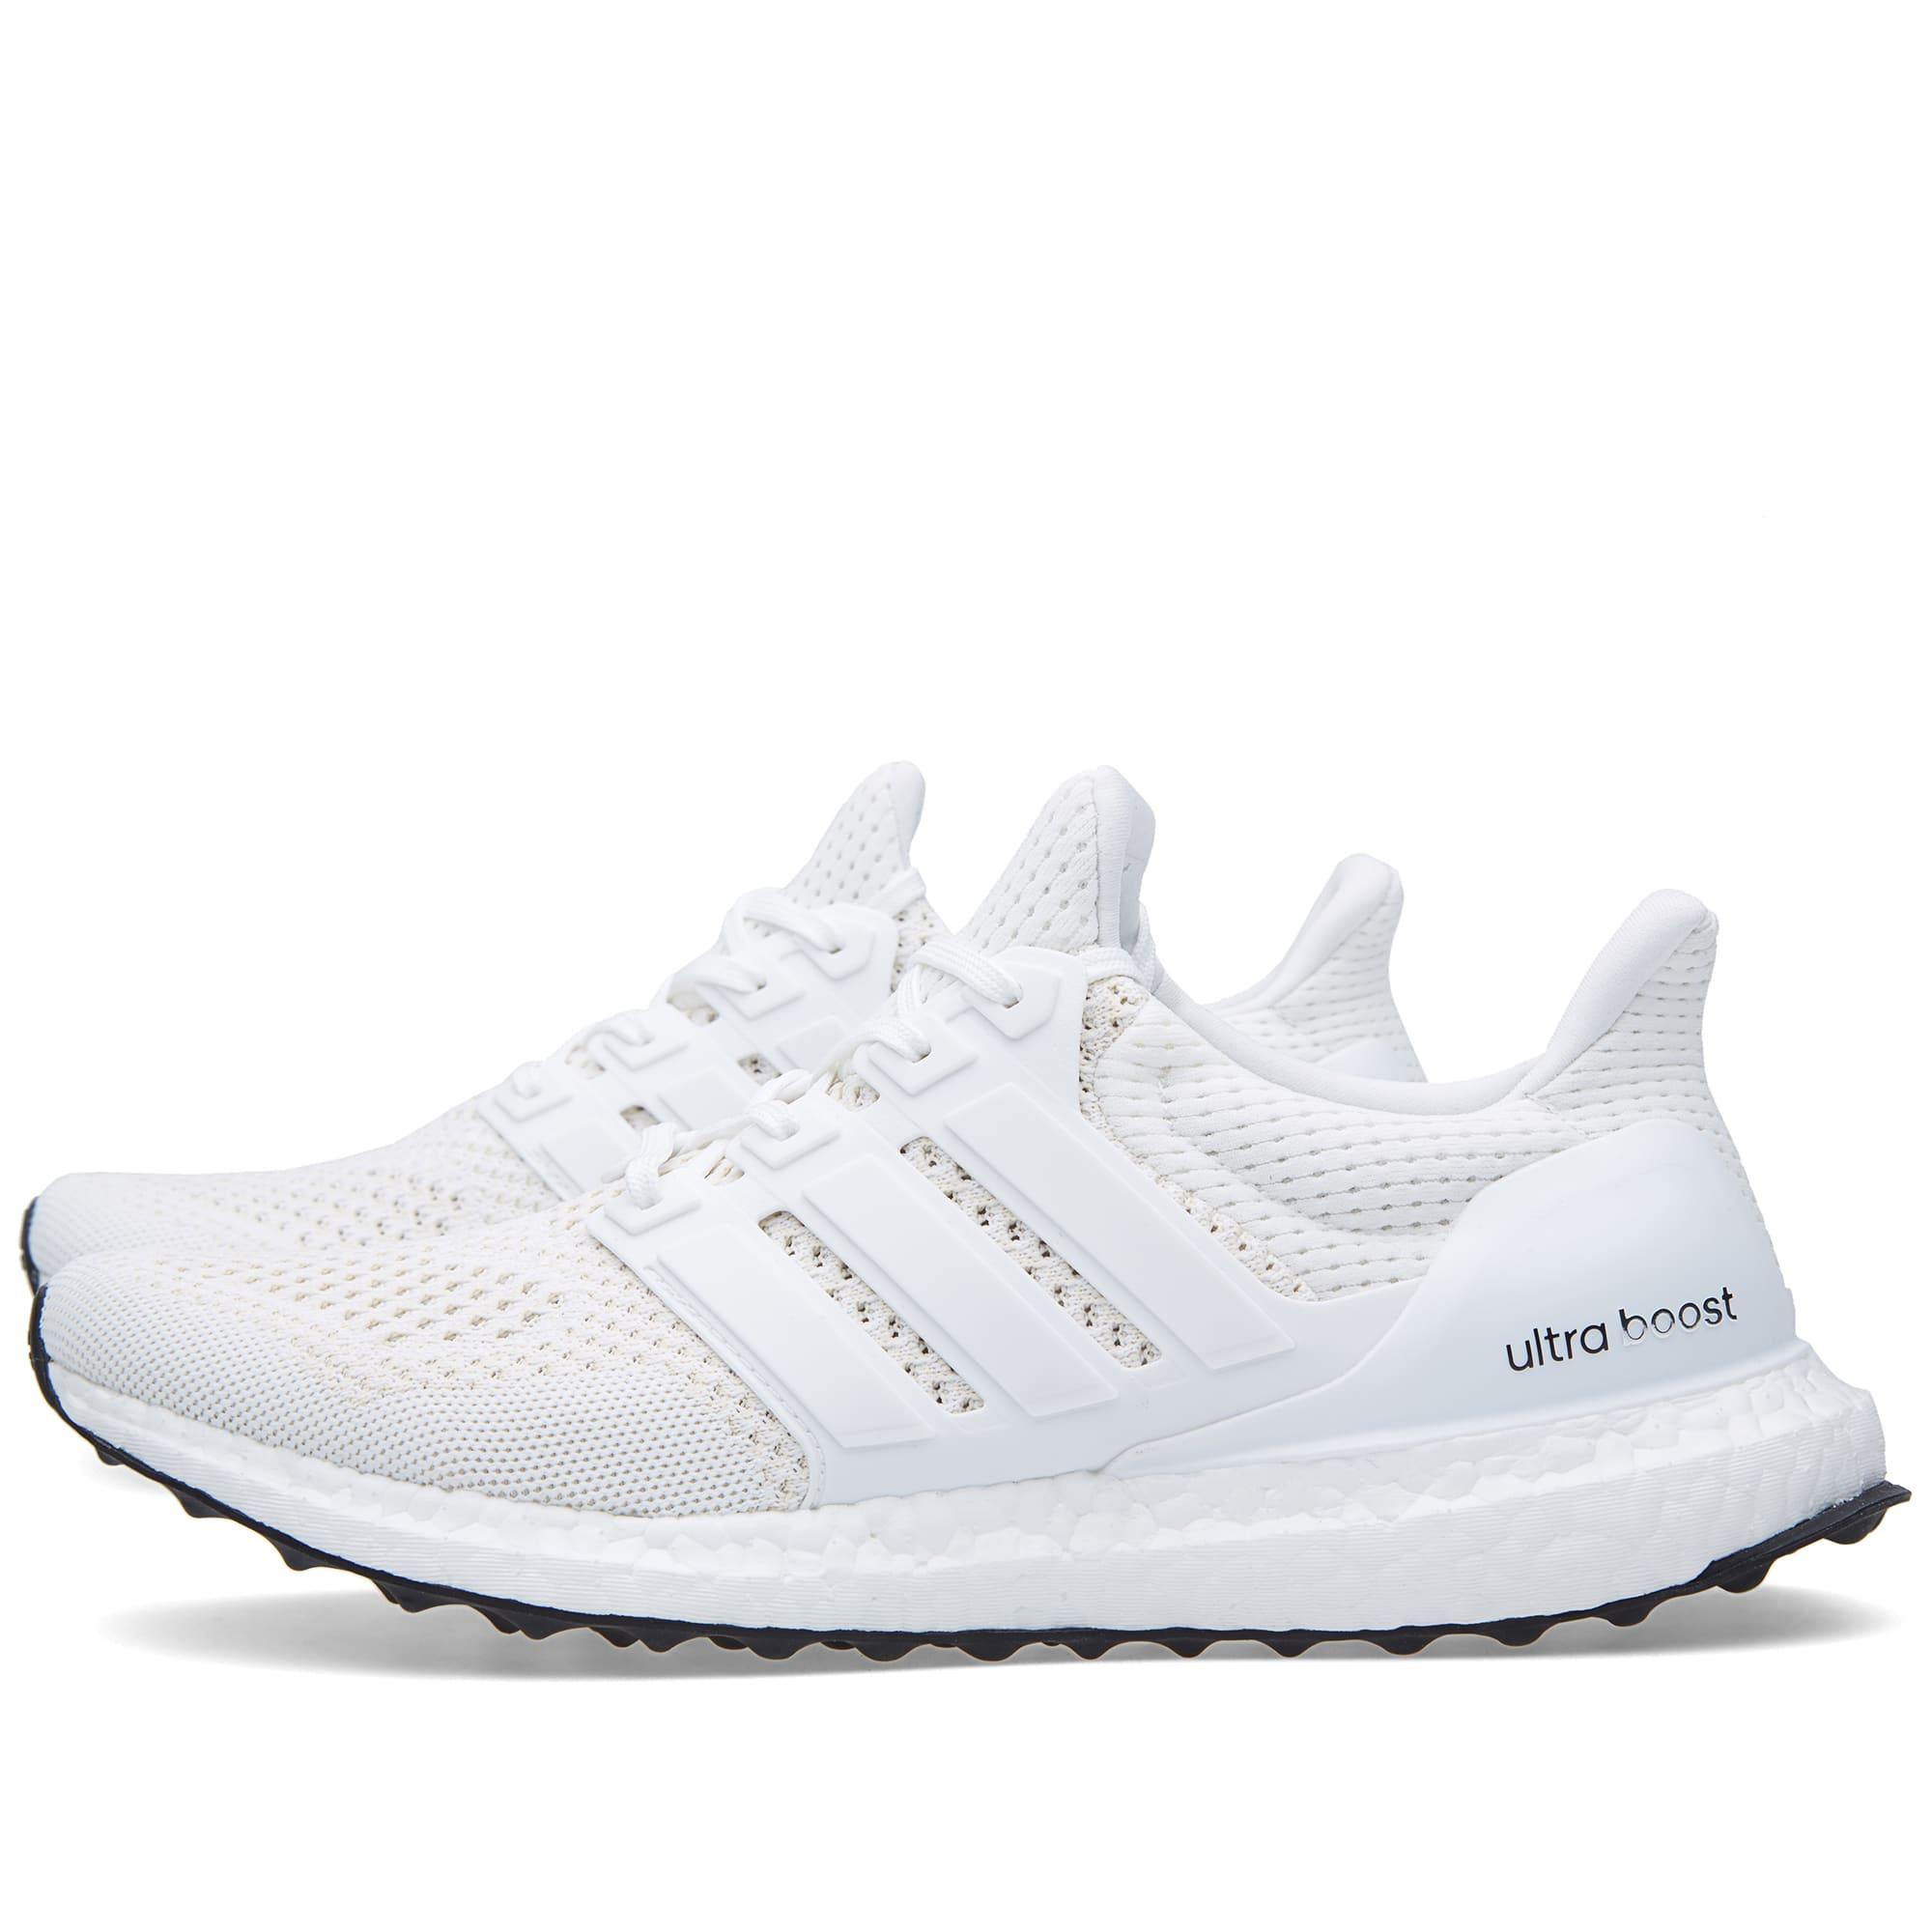 low priced 1b058 b0008 Adidas Ultra Boost M